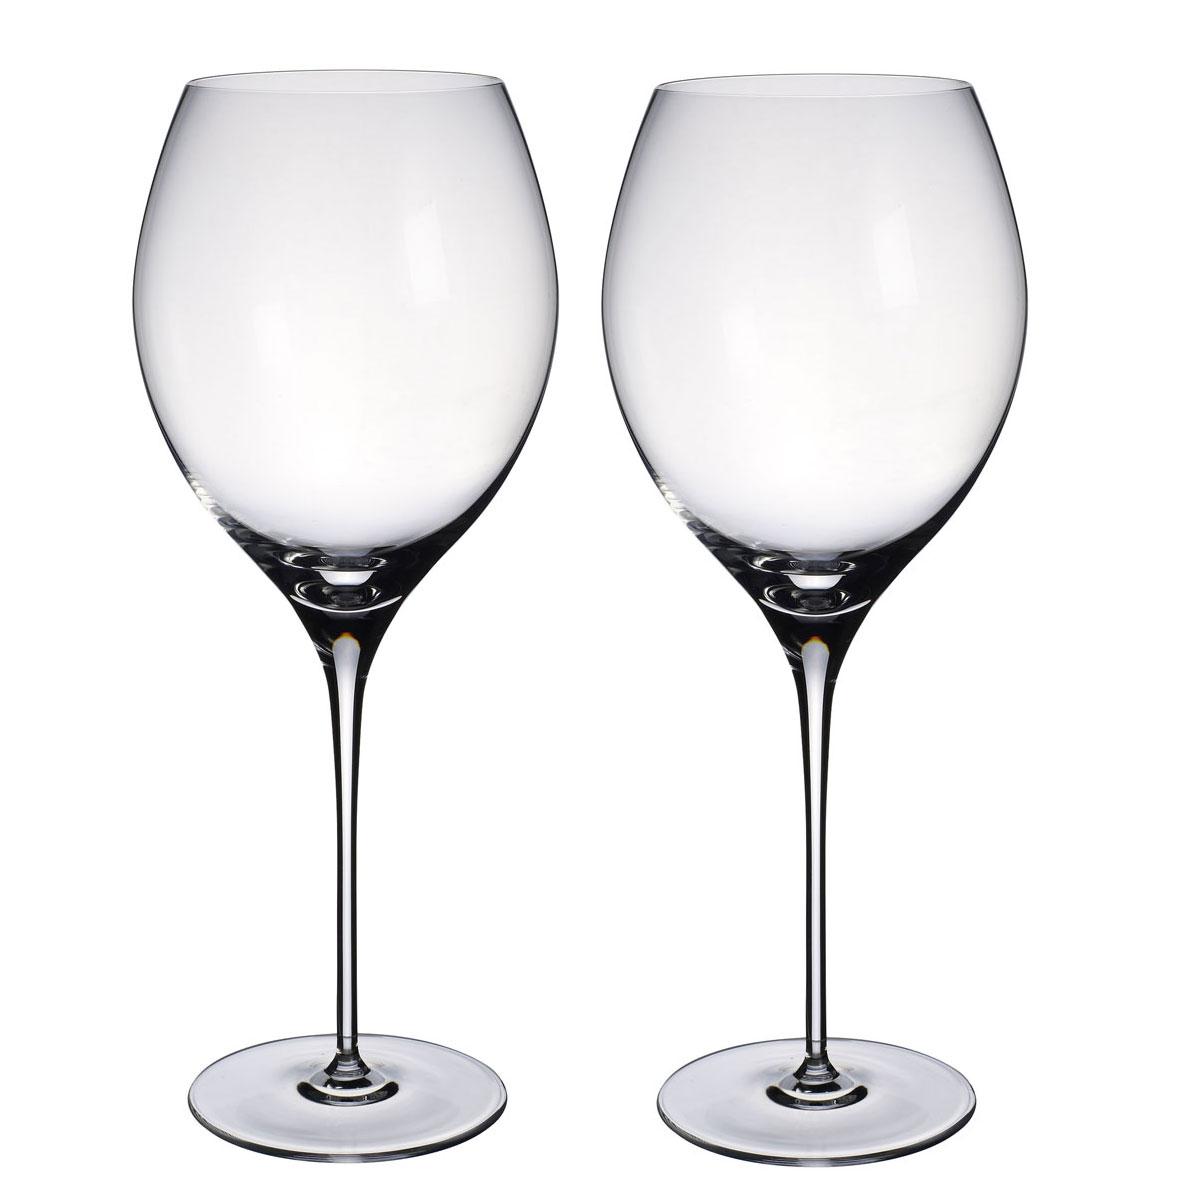 Villeroy and Boch Allegorie Premium Bordeaux, Grand Cru Pair